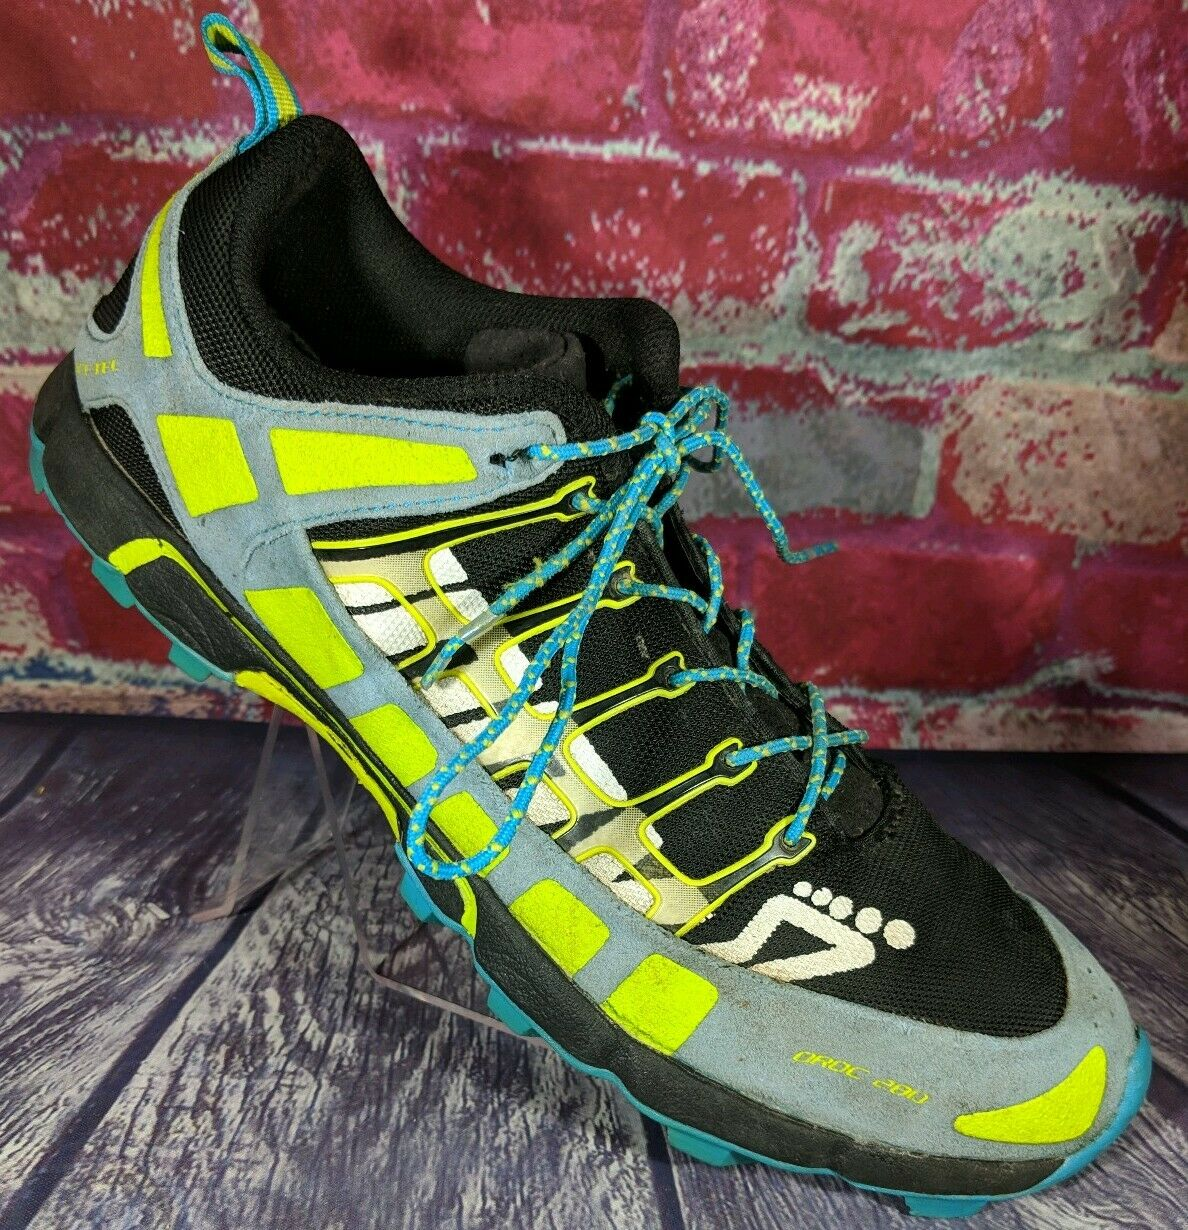 INOV oroc 280 Orienteer Trail Trail Trail Running scarpe Snow Winter Spikes Uomo 10 donna 11.5 bd21e2